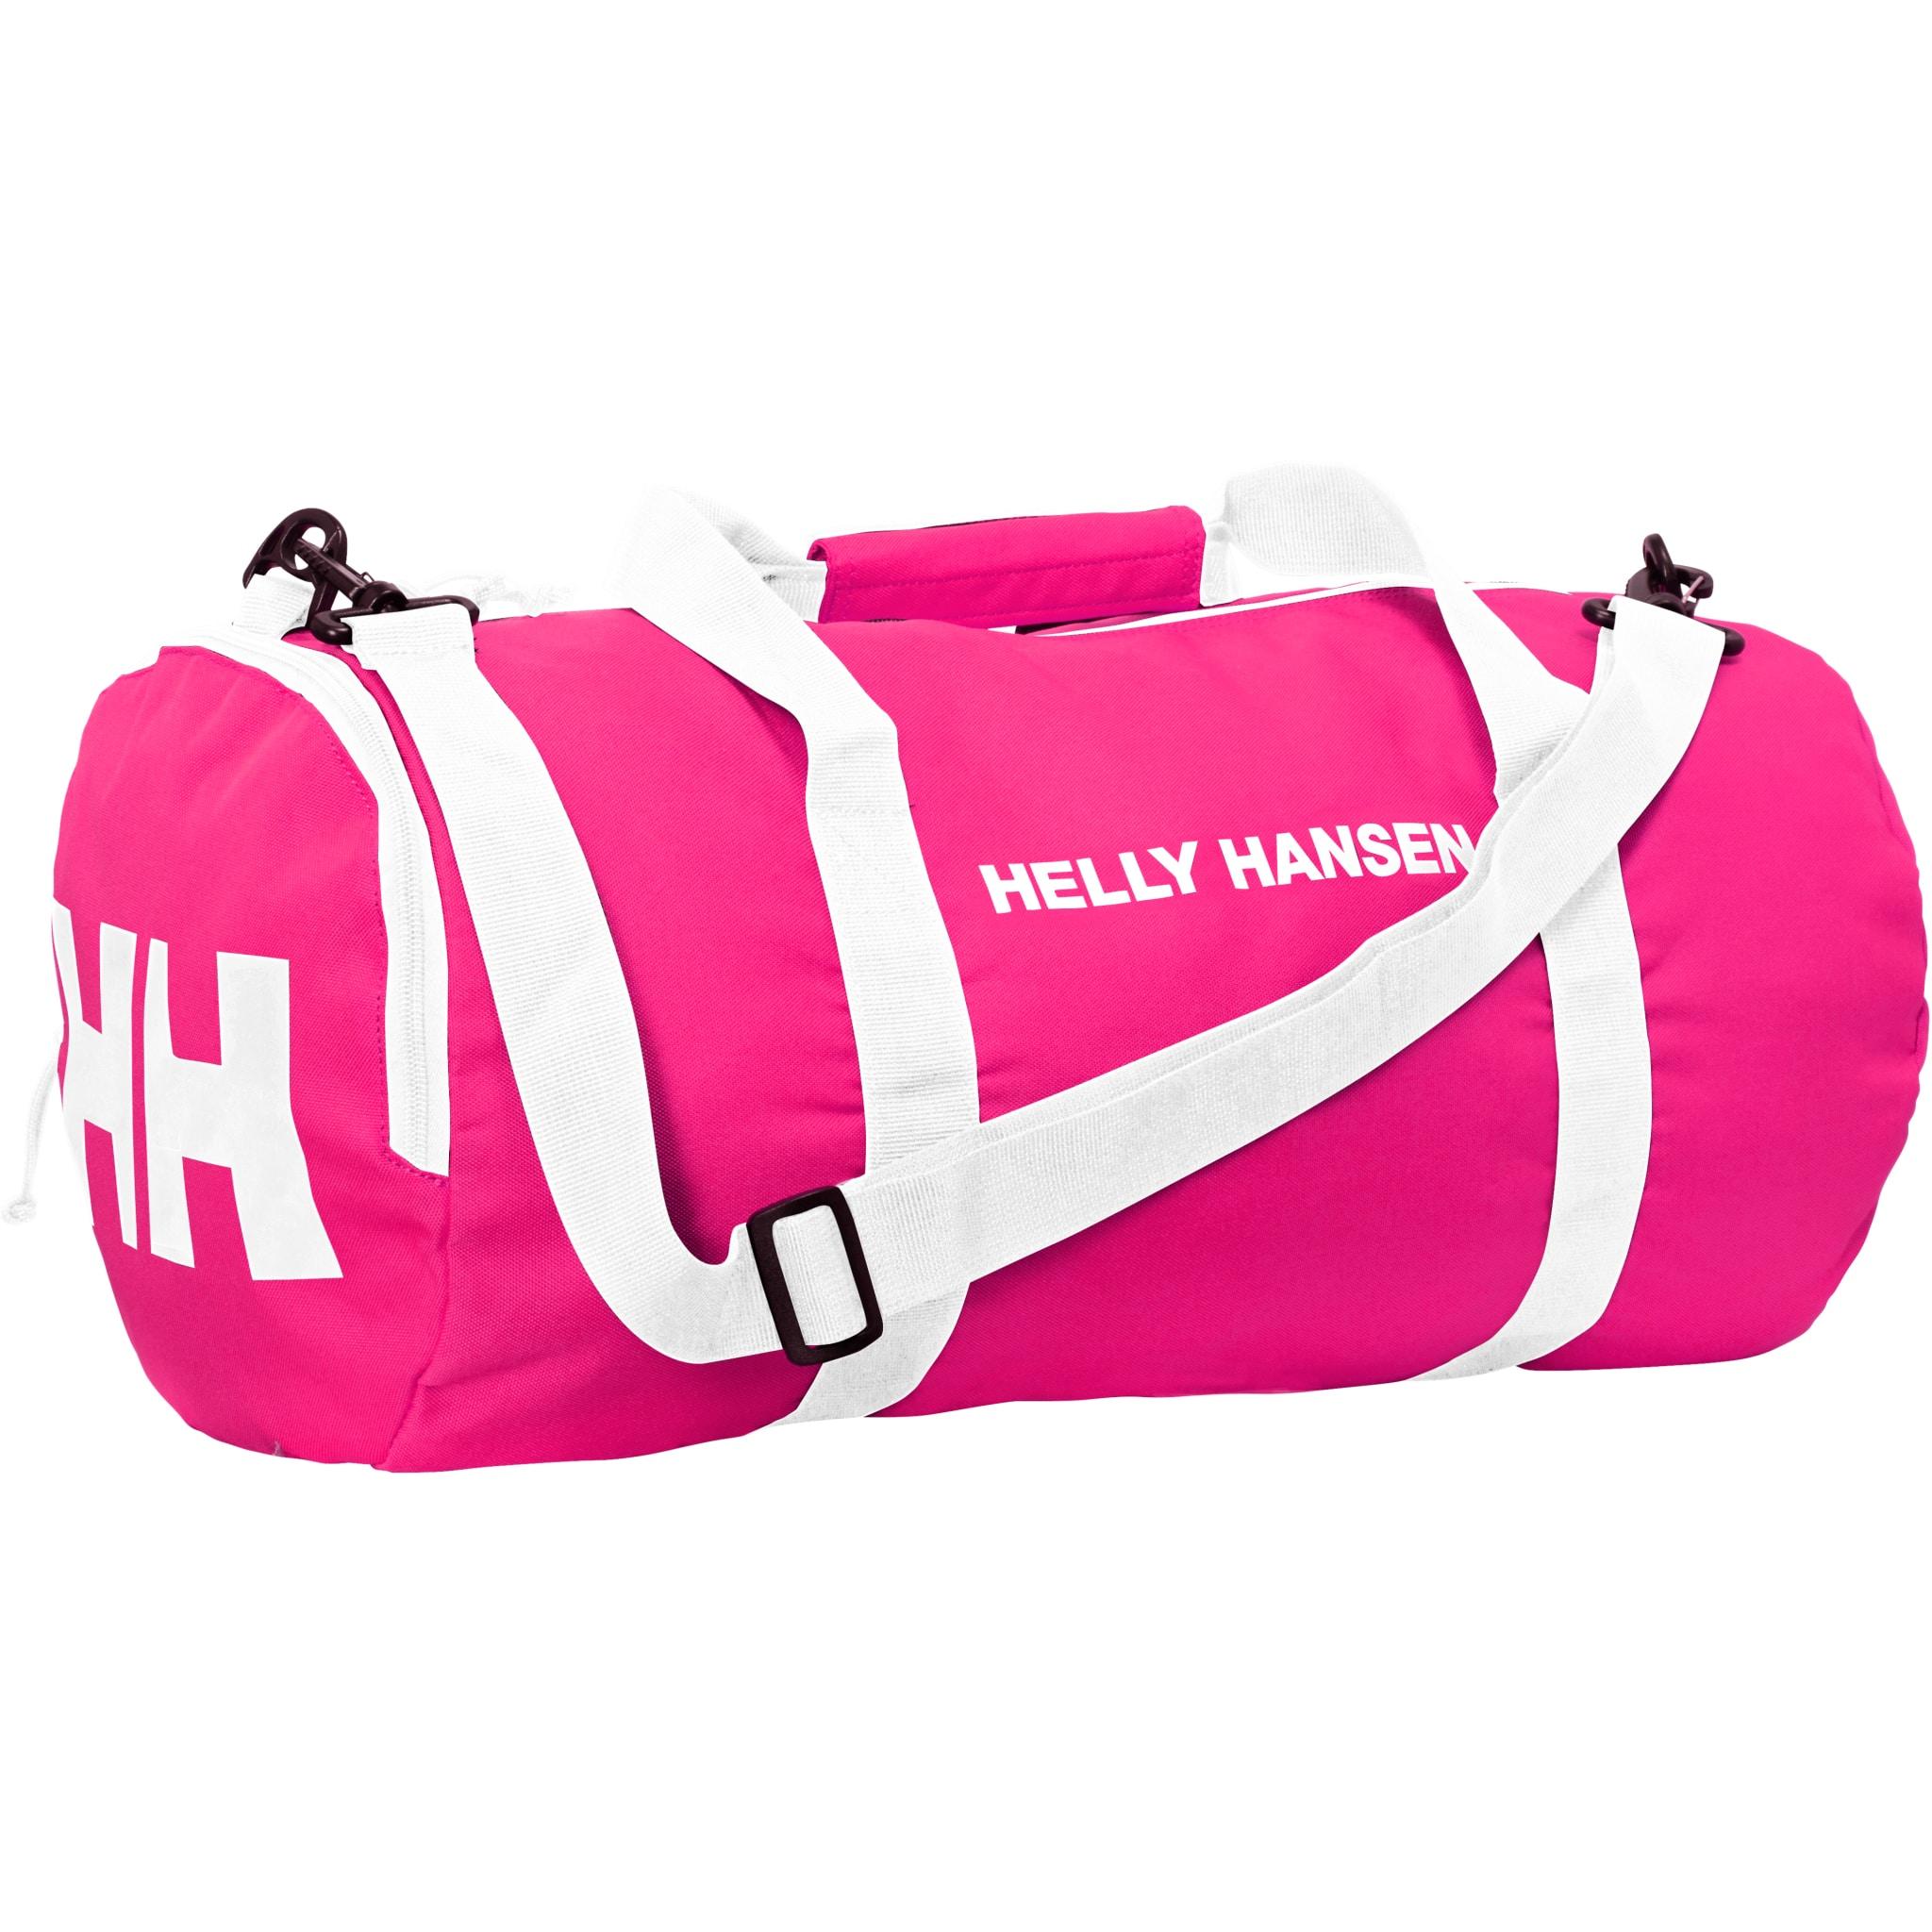 En lett, sammenleggbar 65L duffelbag.